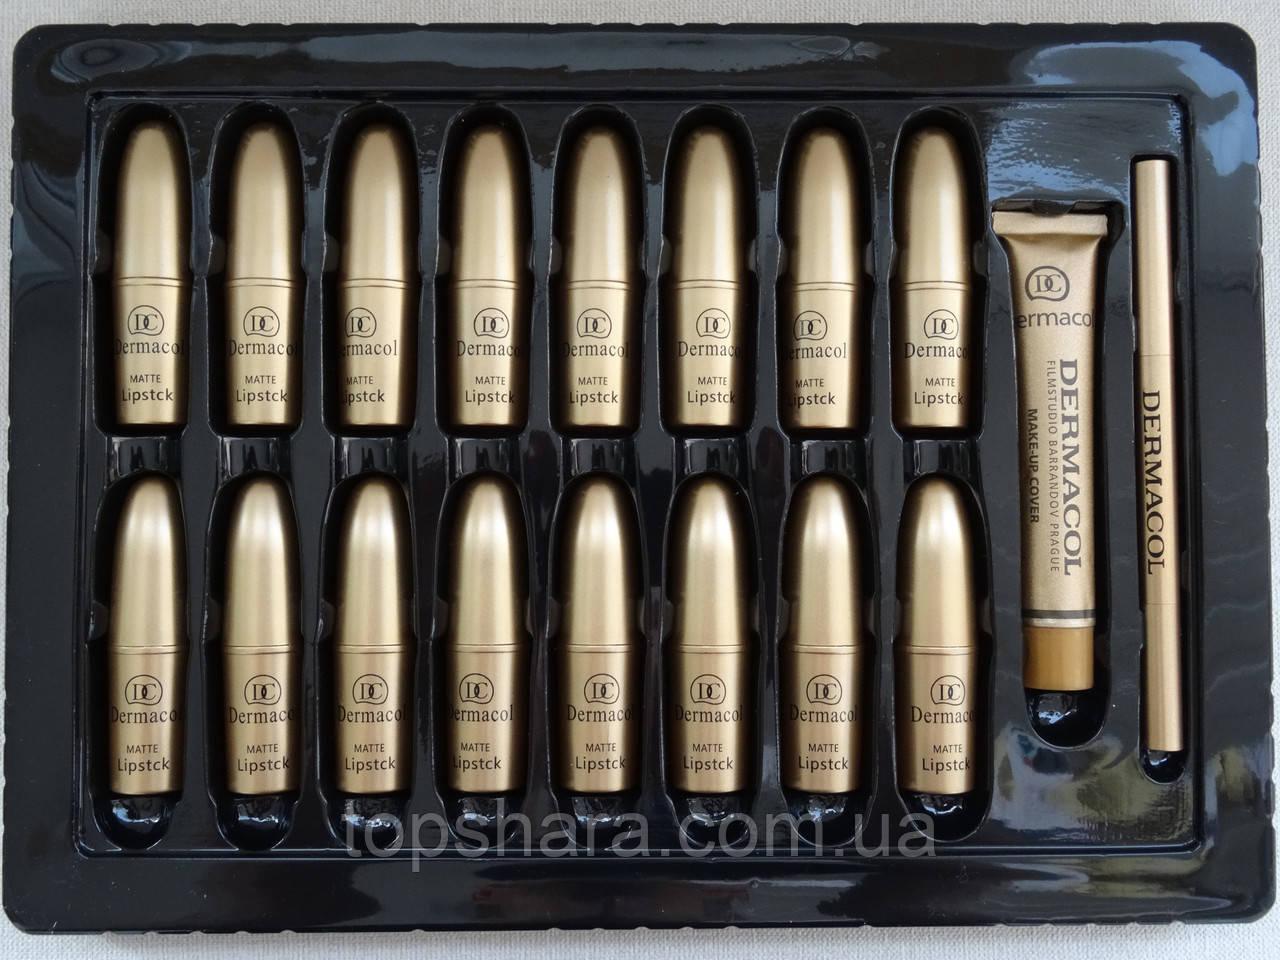 Набір matte liquid lipstck Dermacol 18 в 1 + тональний крем, олівець для бров